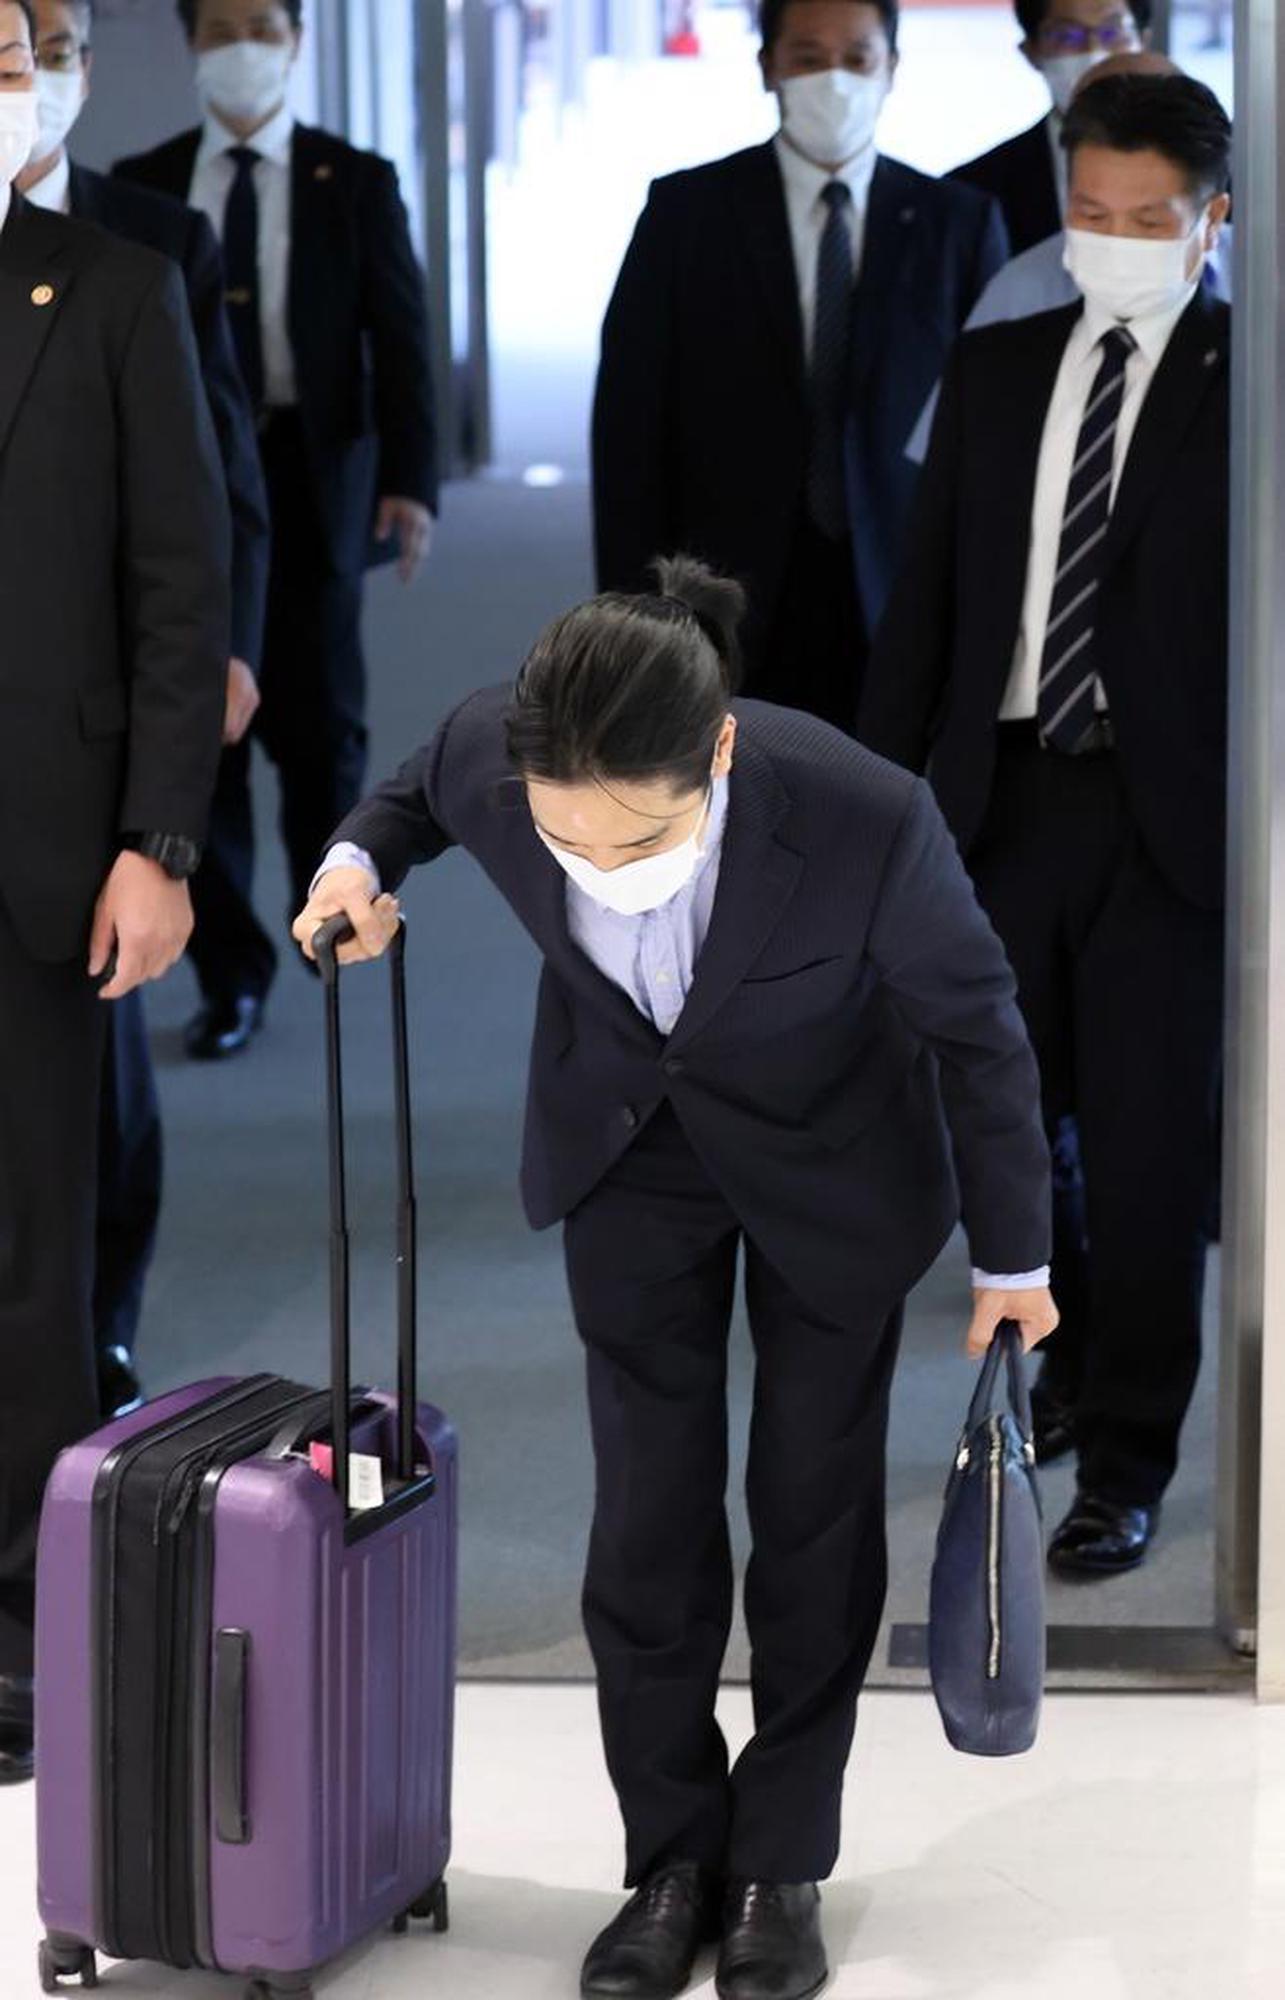 His comeback was aired live: Kei Komuro.